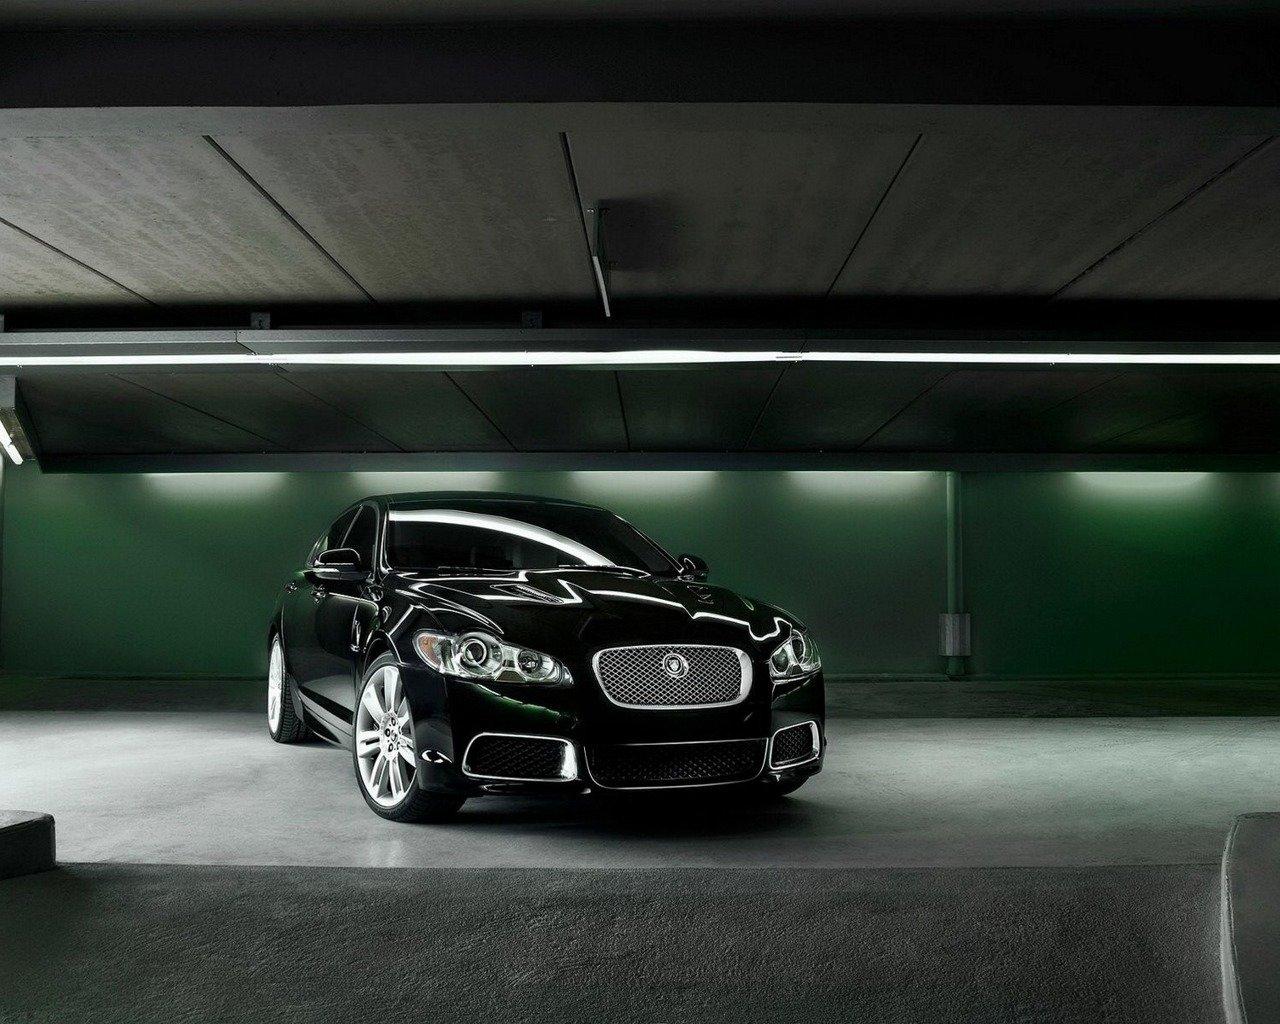 Free Download Jaguar Car Wallpaper Id 398030 Hd 1280x1024 For Pc